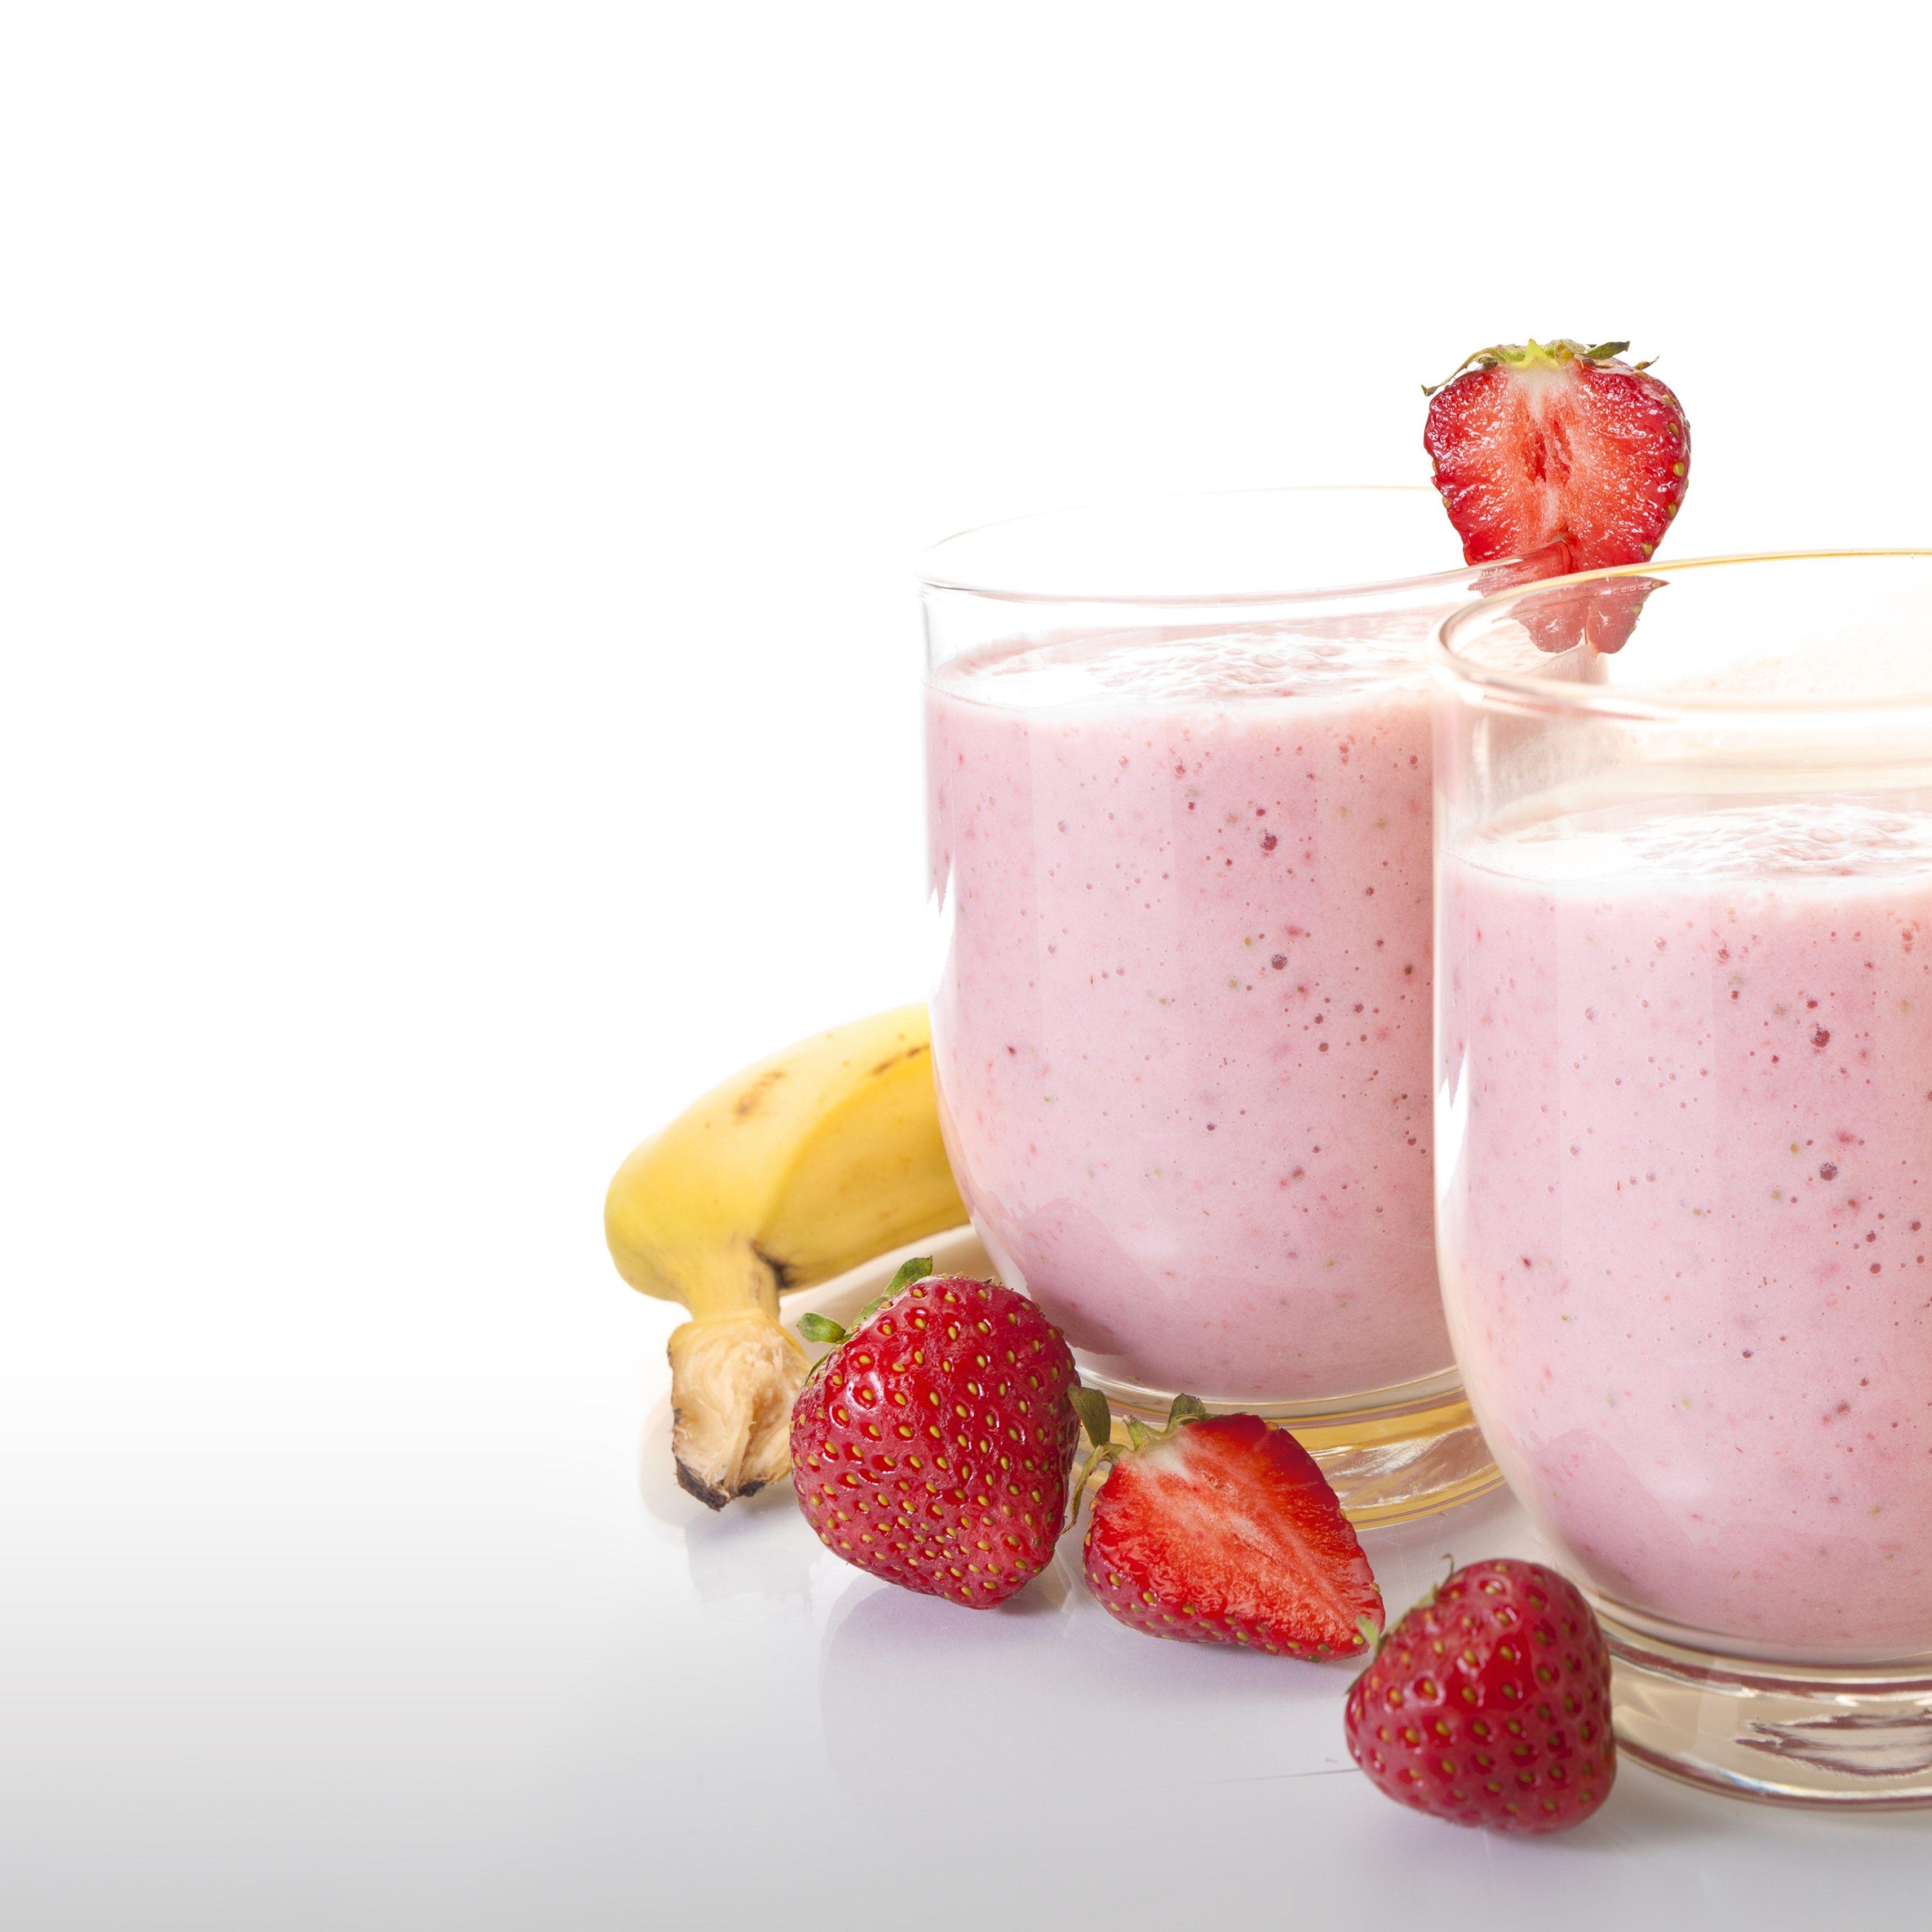 Strawberry Milkshake Wallpaper Hd